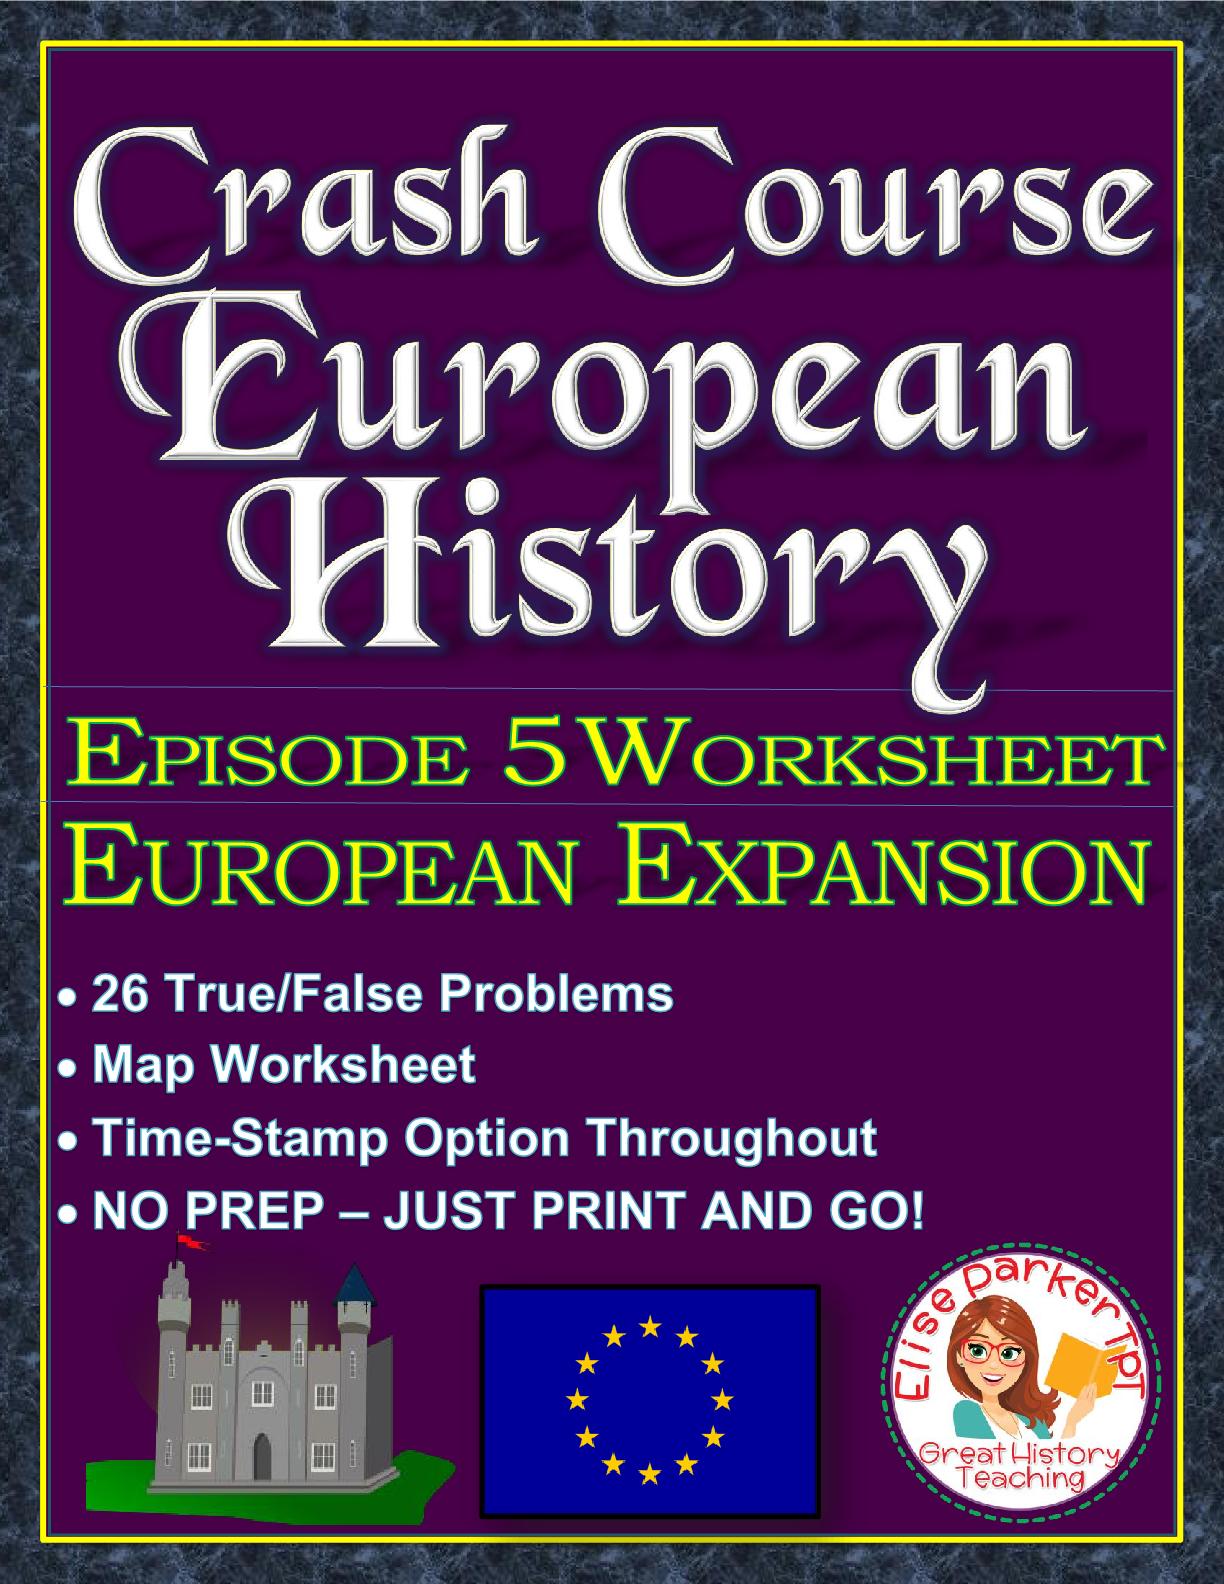 Crash Course European History Episode 5 Worksheet